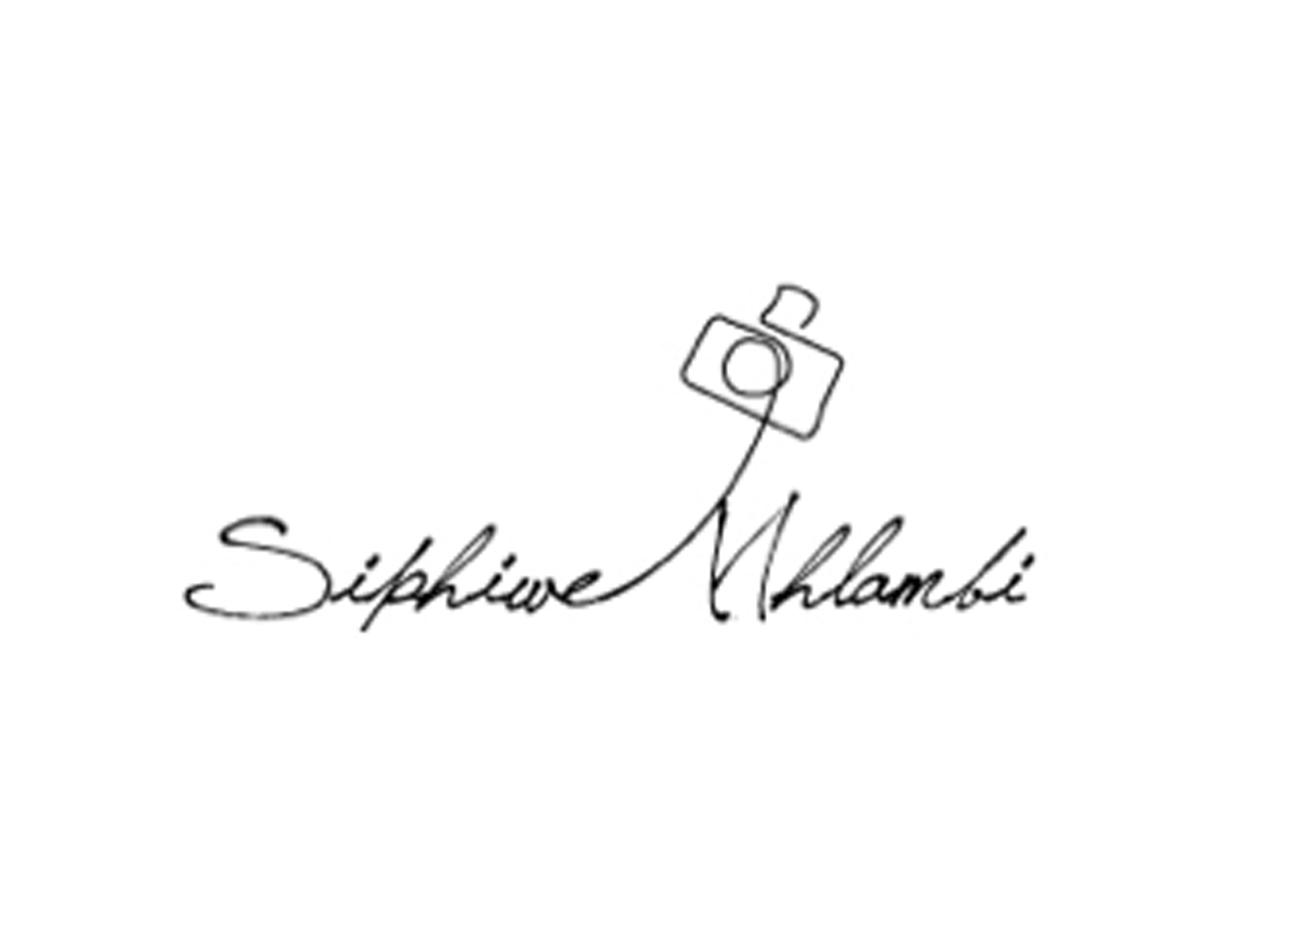 siphiwe-mhlambi-signature-logo-designers-agent-orange-graphic-agency-south-african-branding-company.jpg